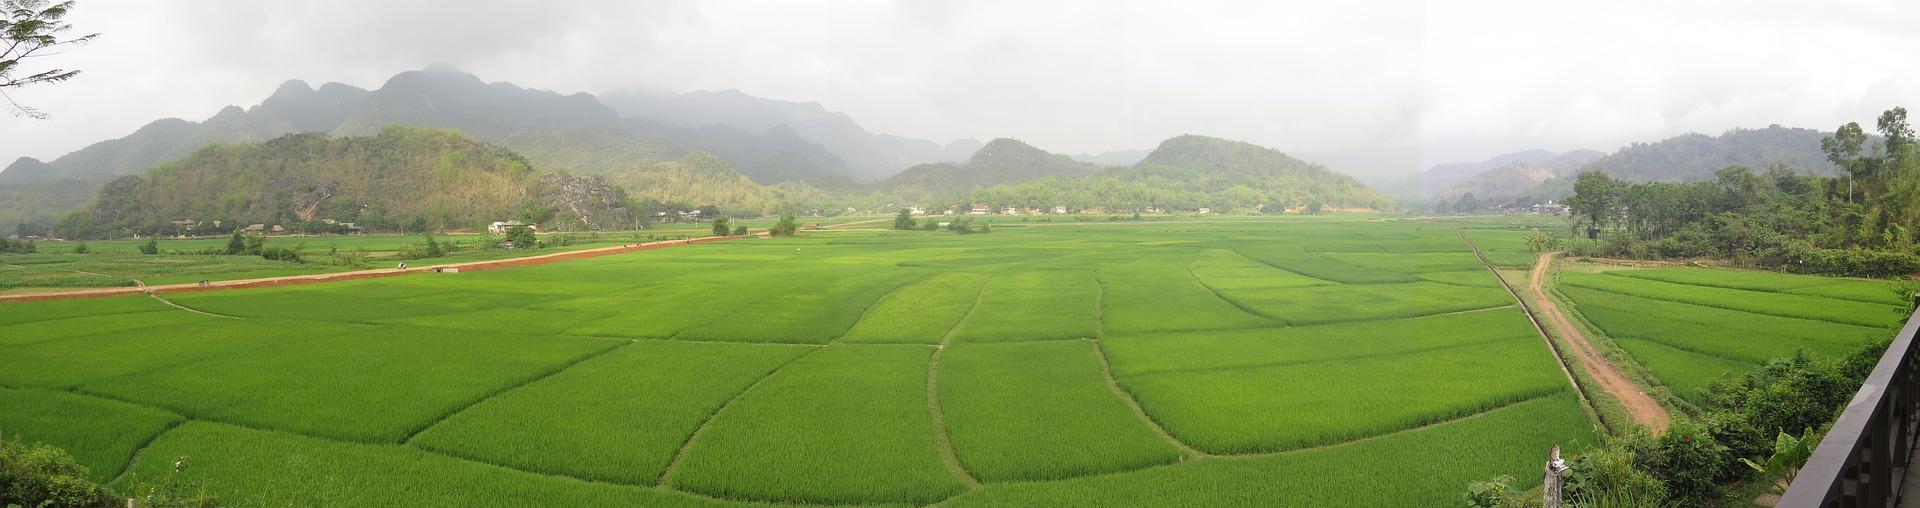 Culture au vietnam